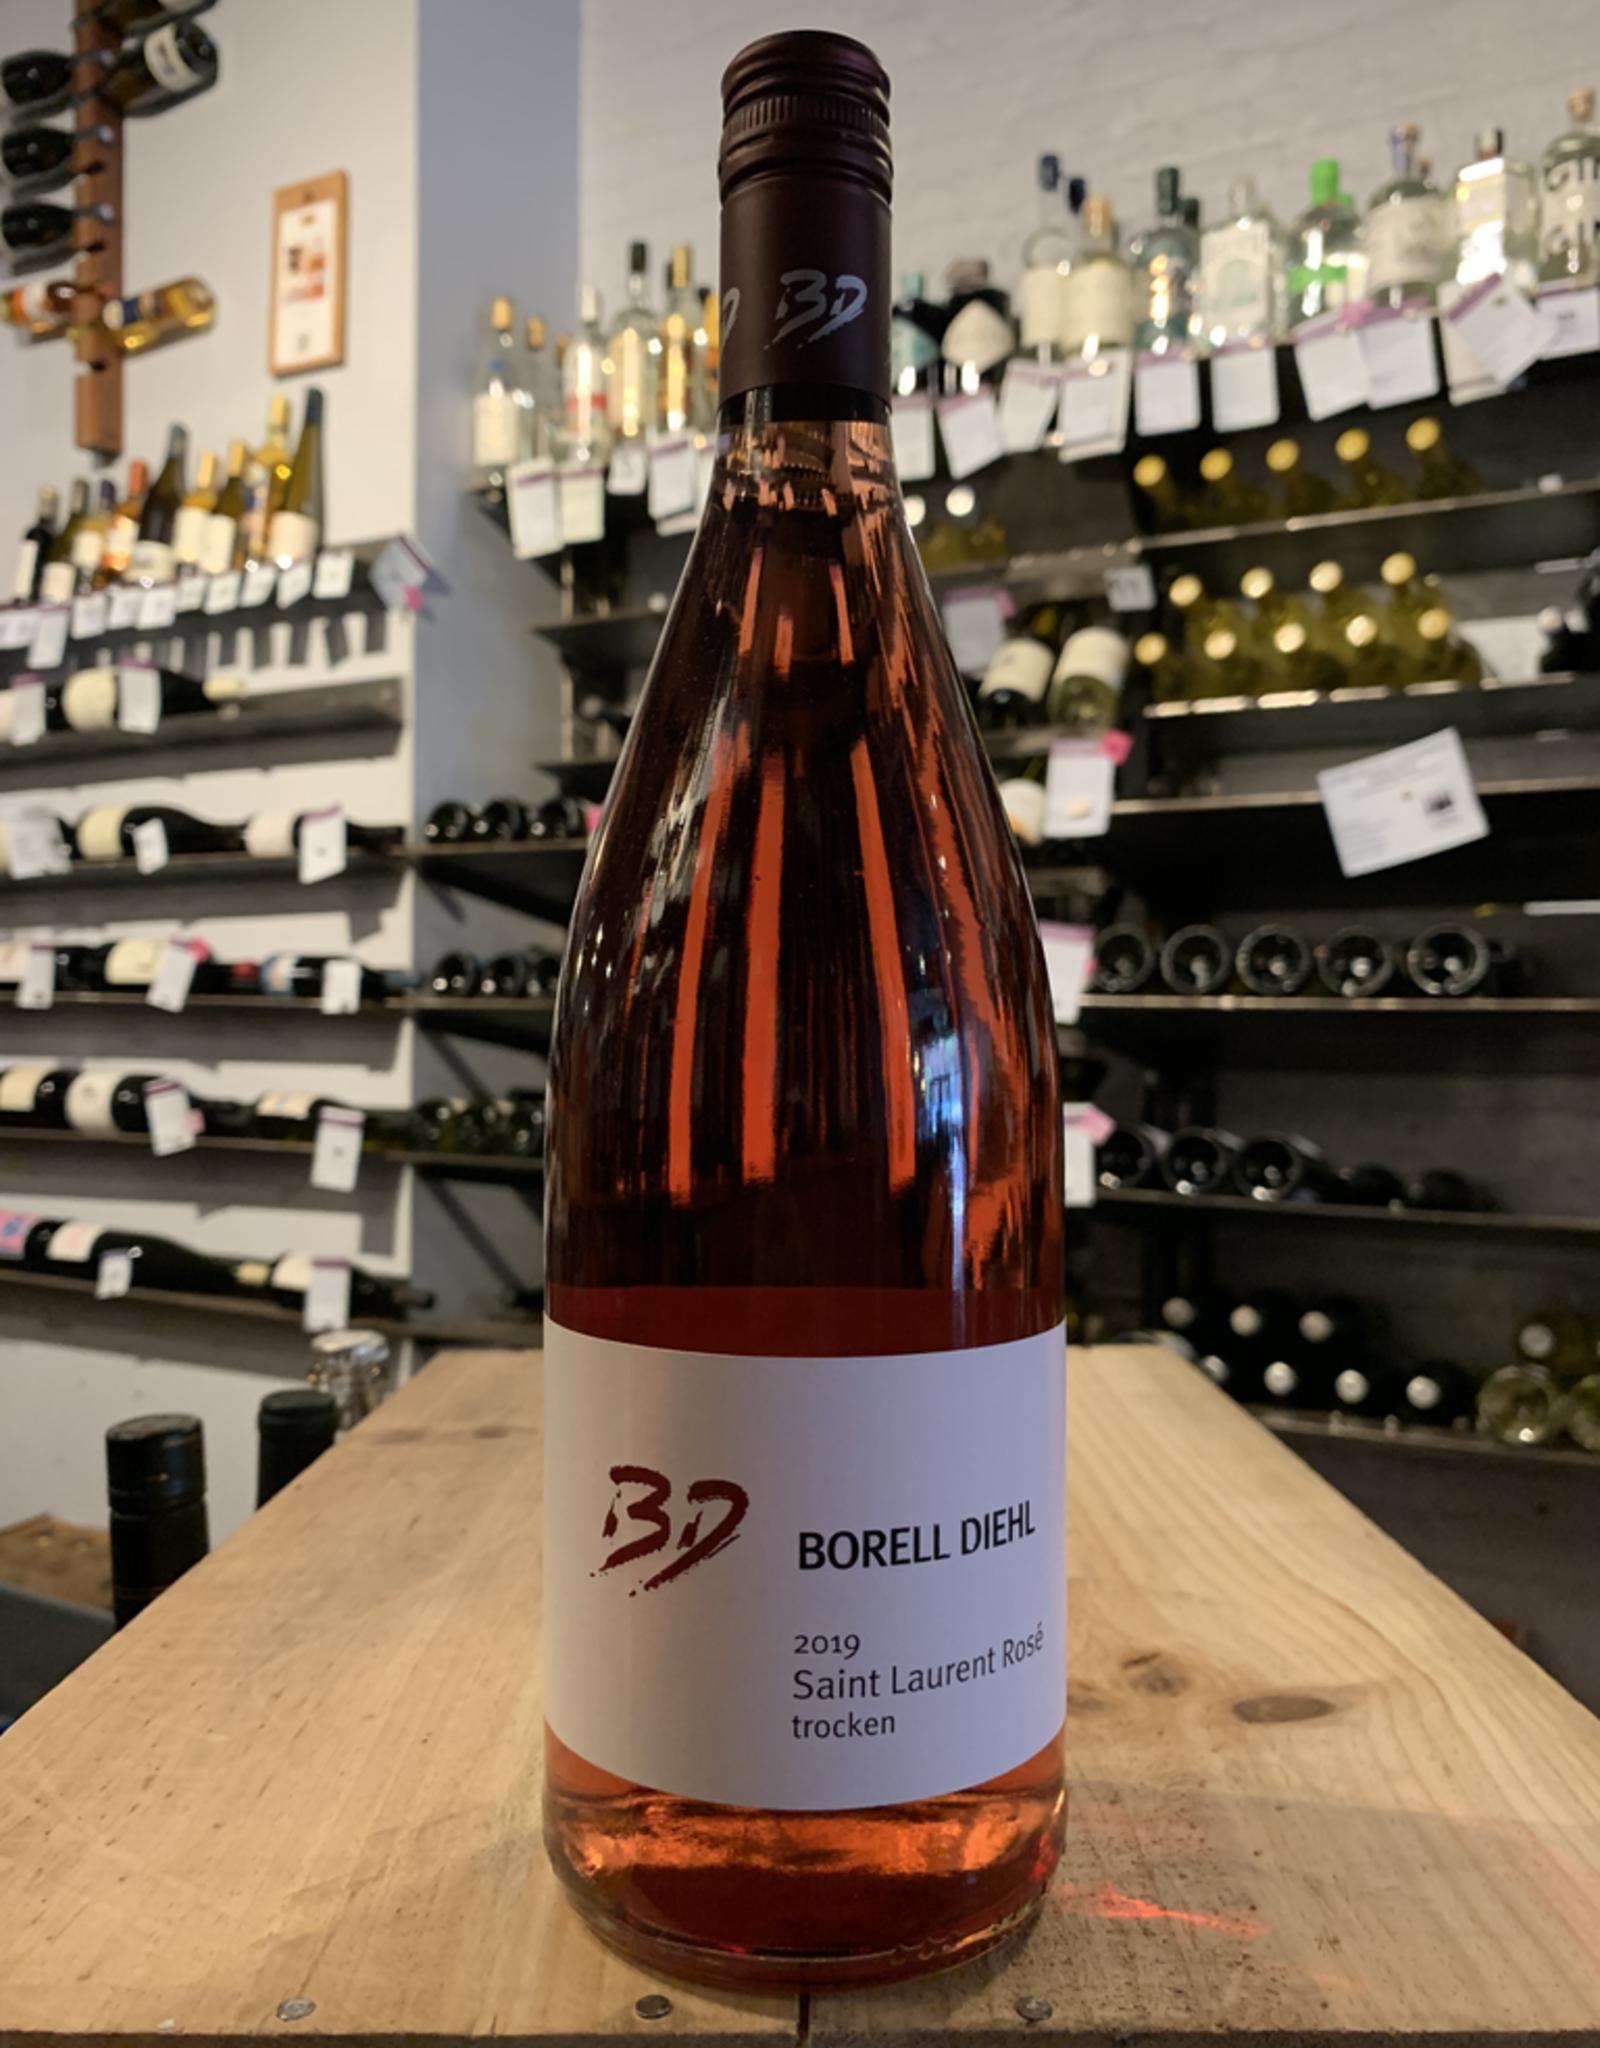 2019 Borell-Diehl Saint Laurent Rose - Pfalz, Germany (1Ltr)